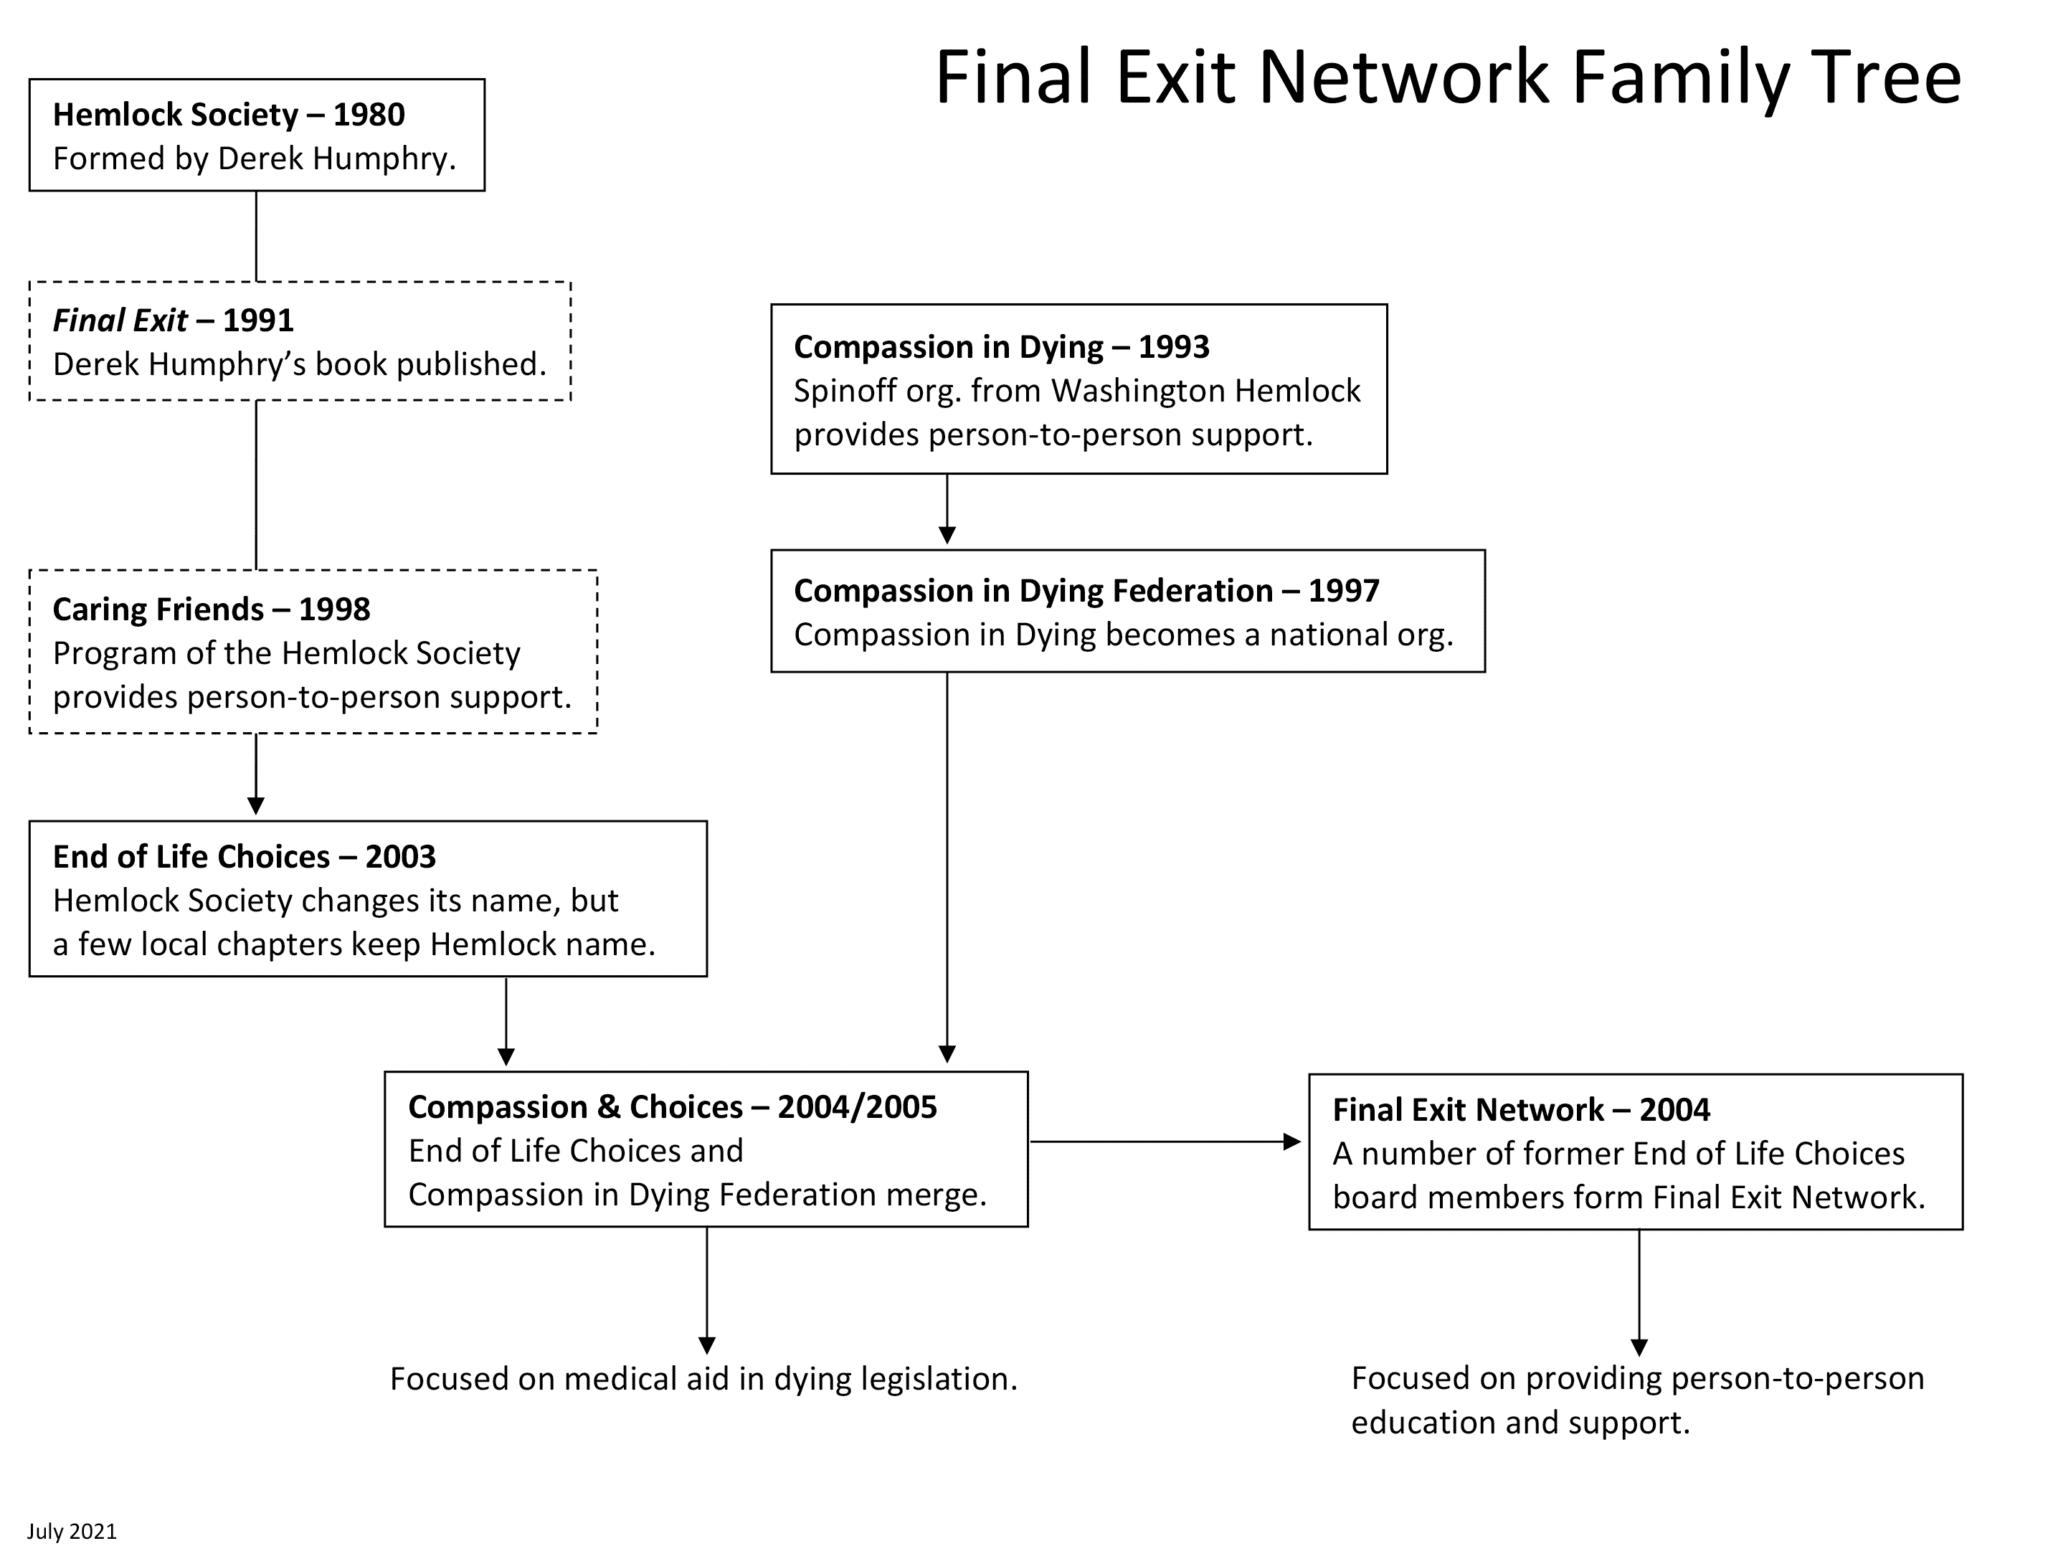 FEN Family Tree 2021